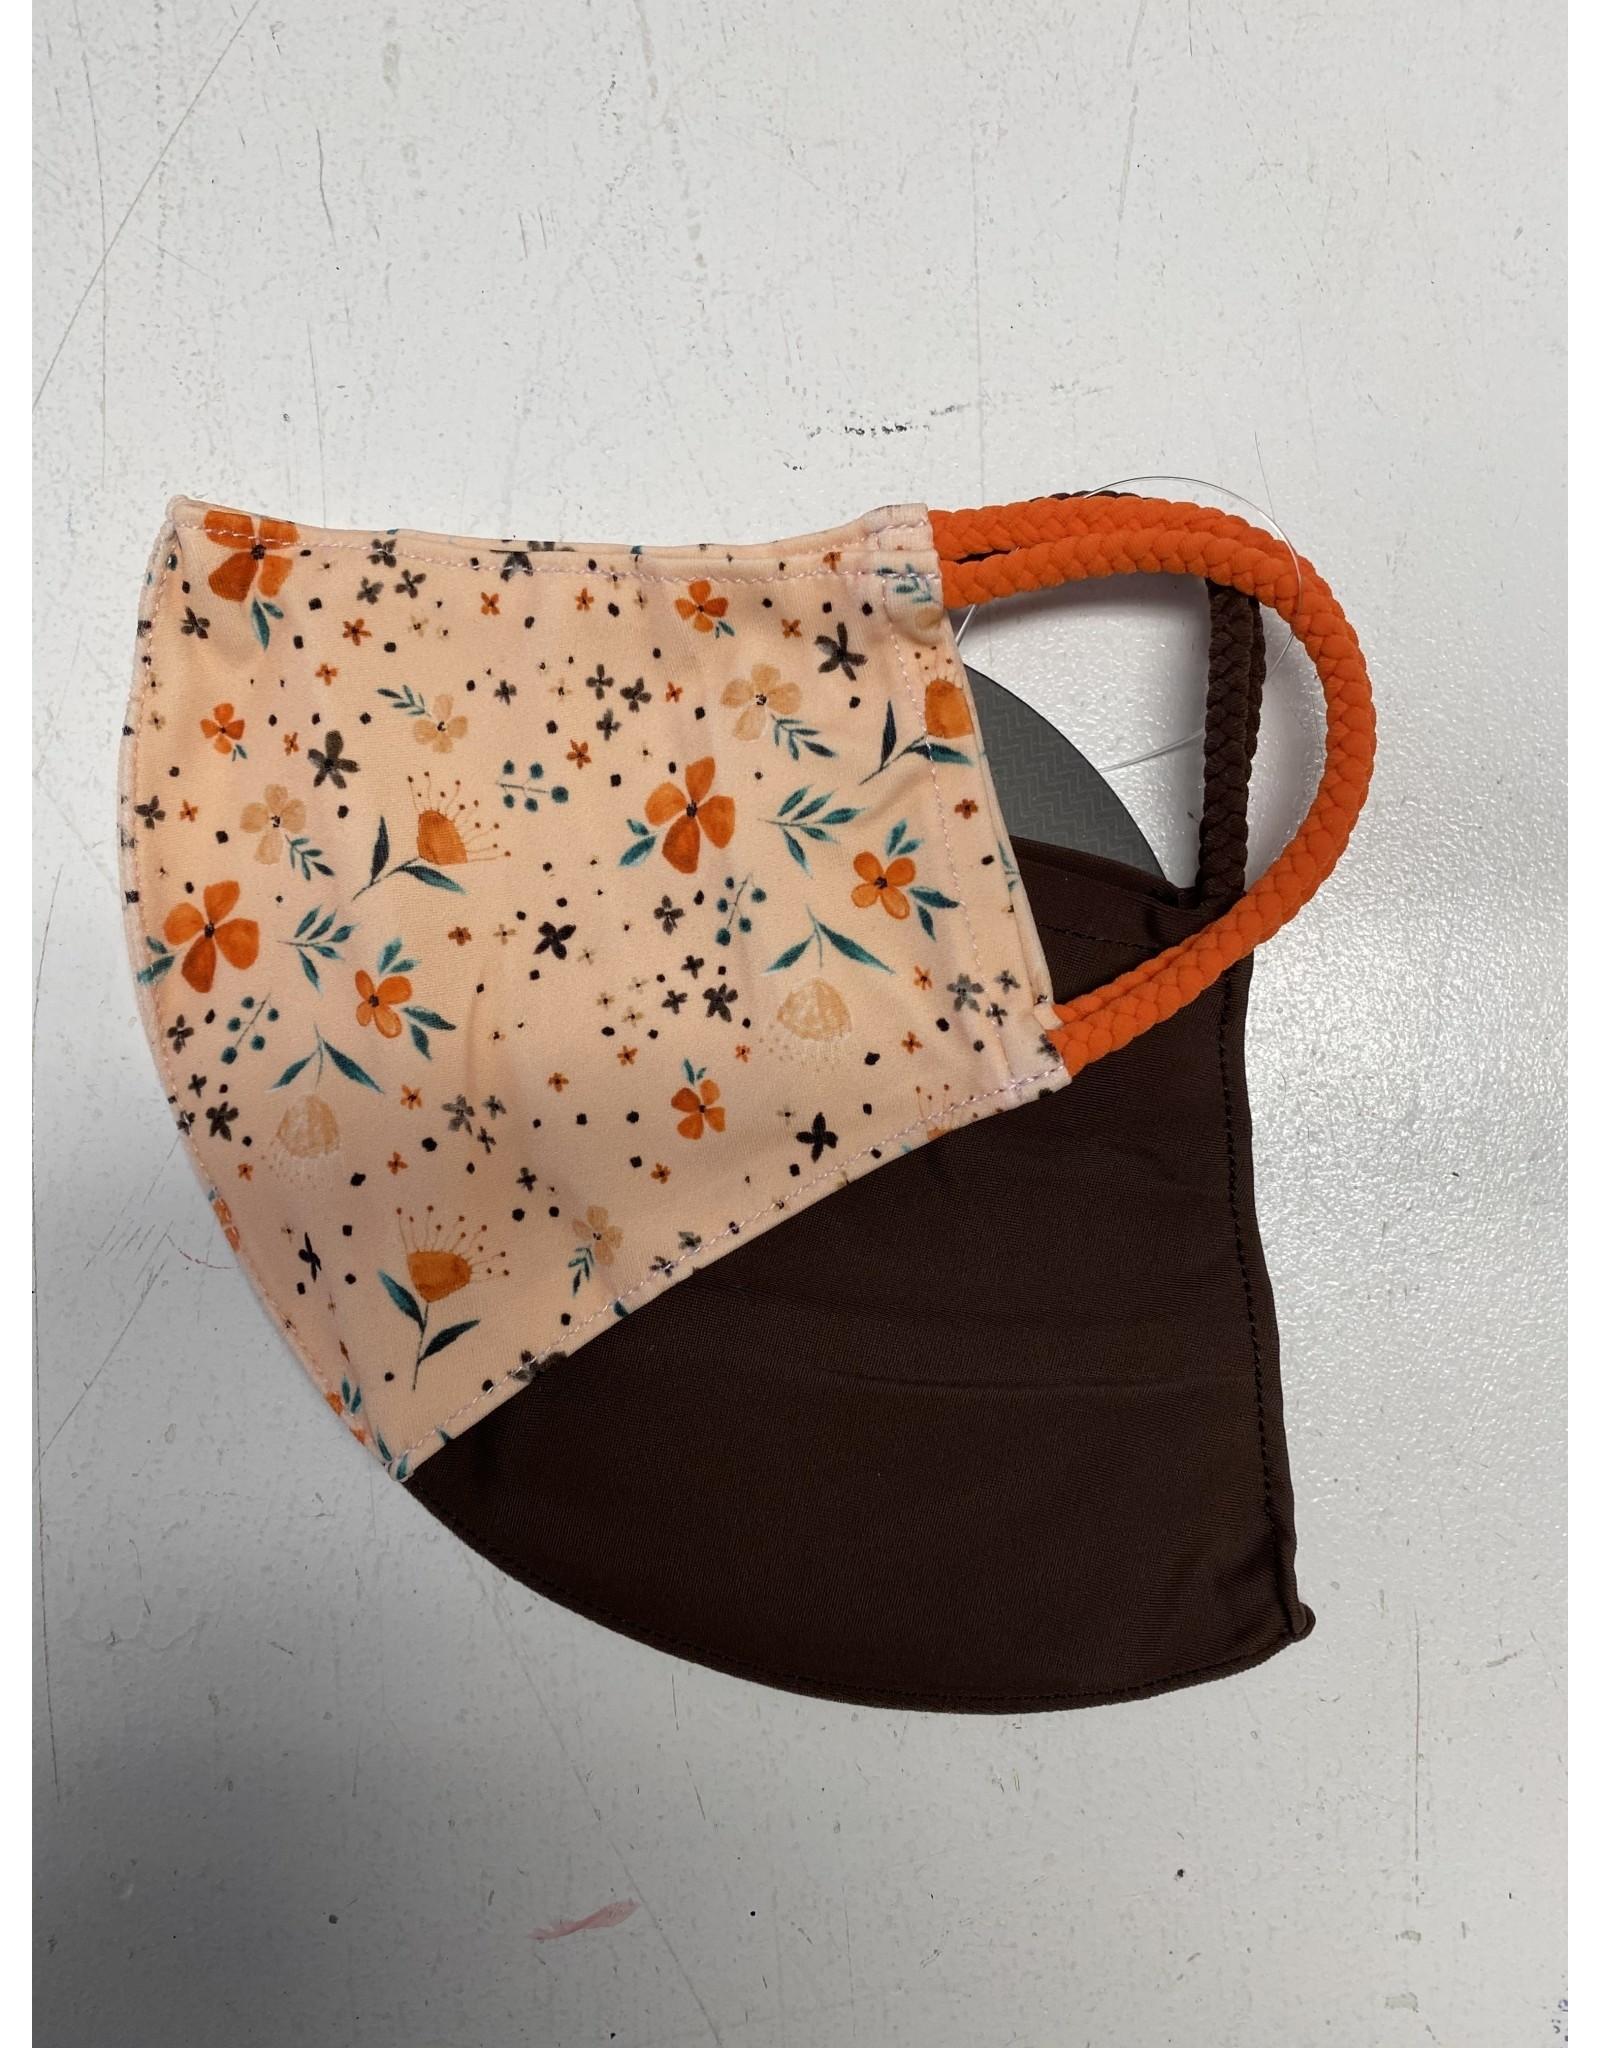 Pomchies Mask - Dainty Flowers/Brown